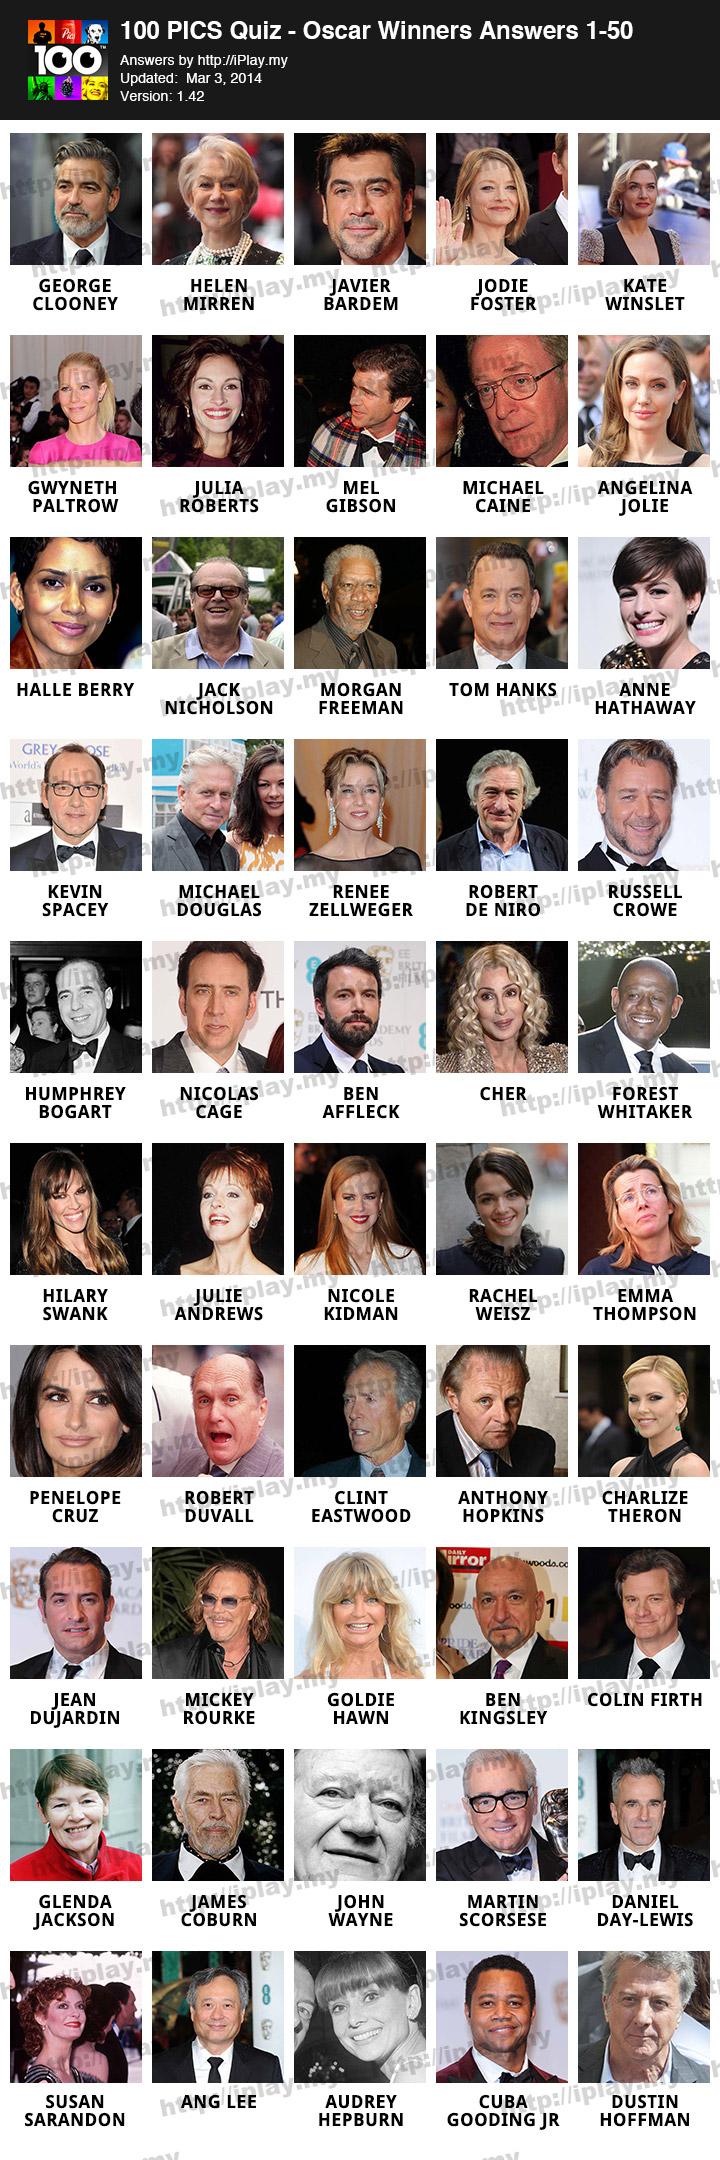 100 Pics Answers Movie Stars : answers, movie, stars, Oscar, Winners, Answers, IPlay.my